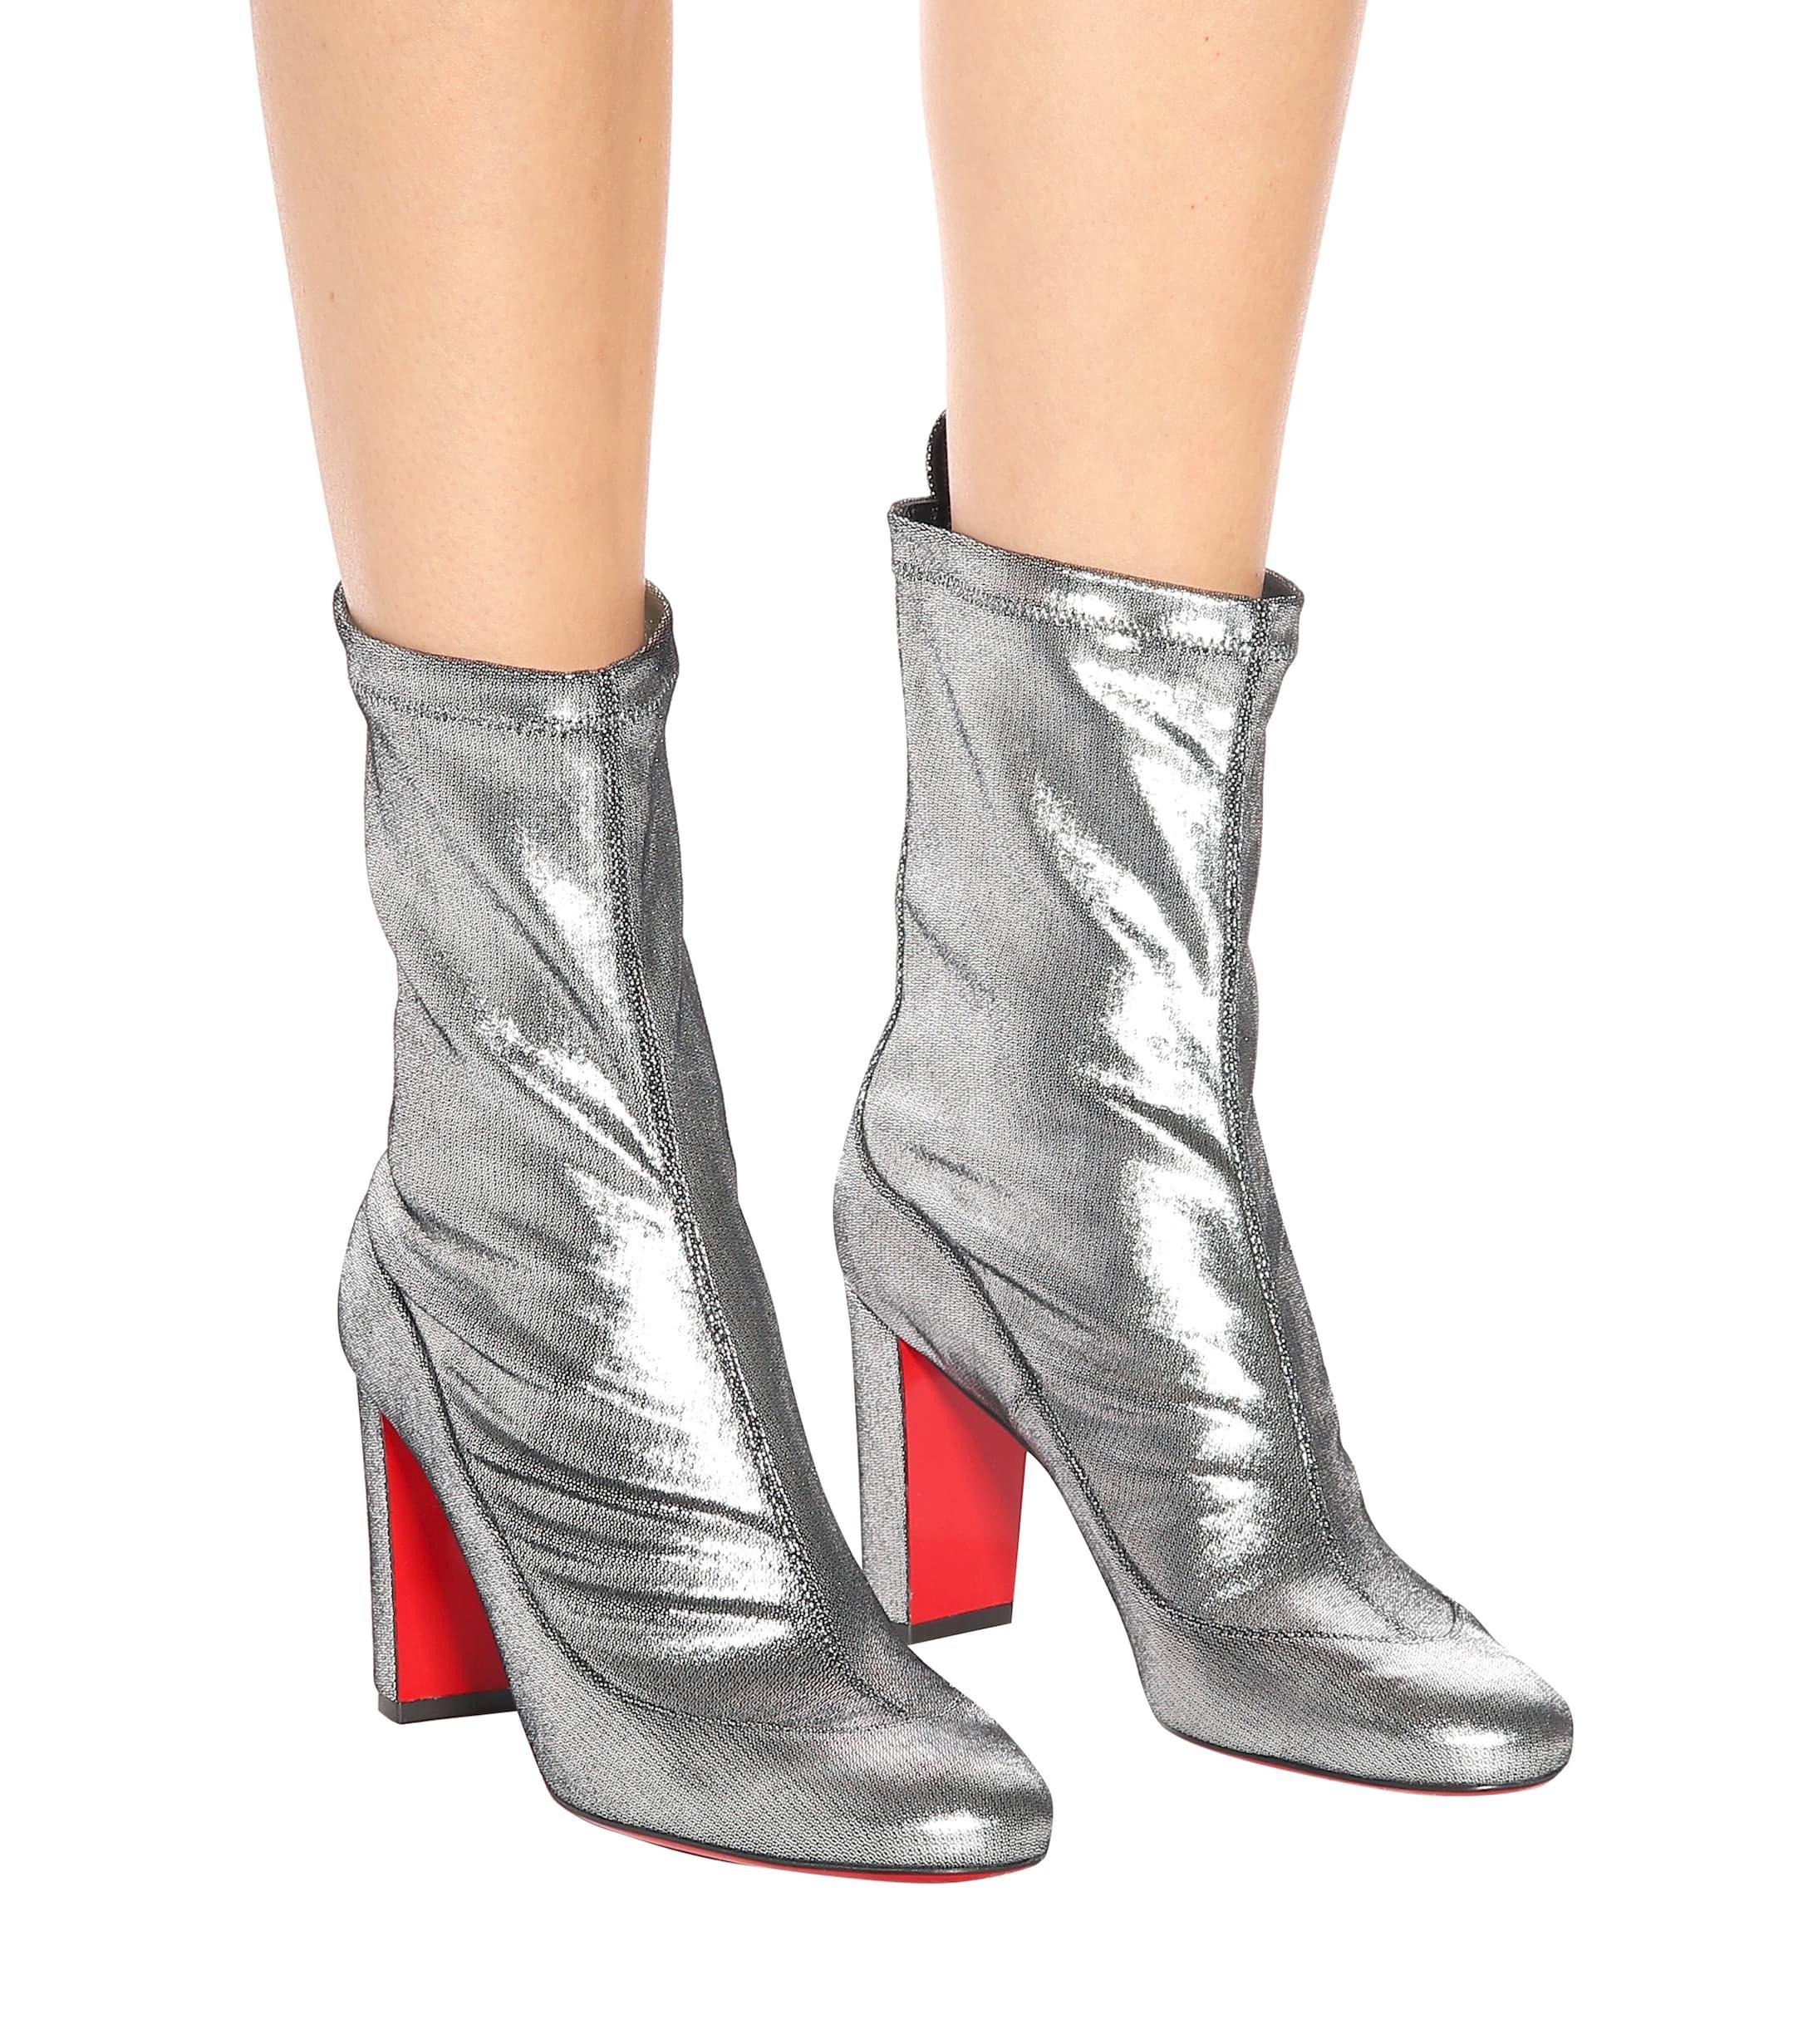 aeff0ca27350 Christian Louboutin - Gena 85 Metallic Leather Boots - Lyst. View fullscreen